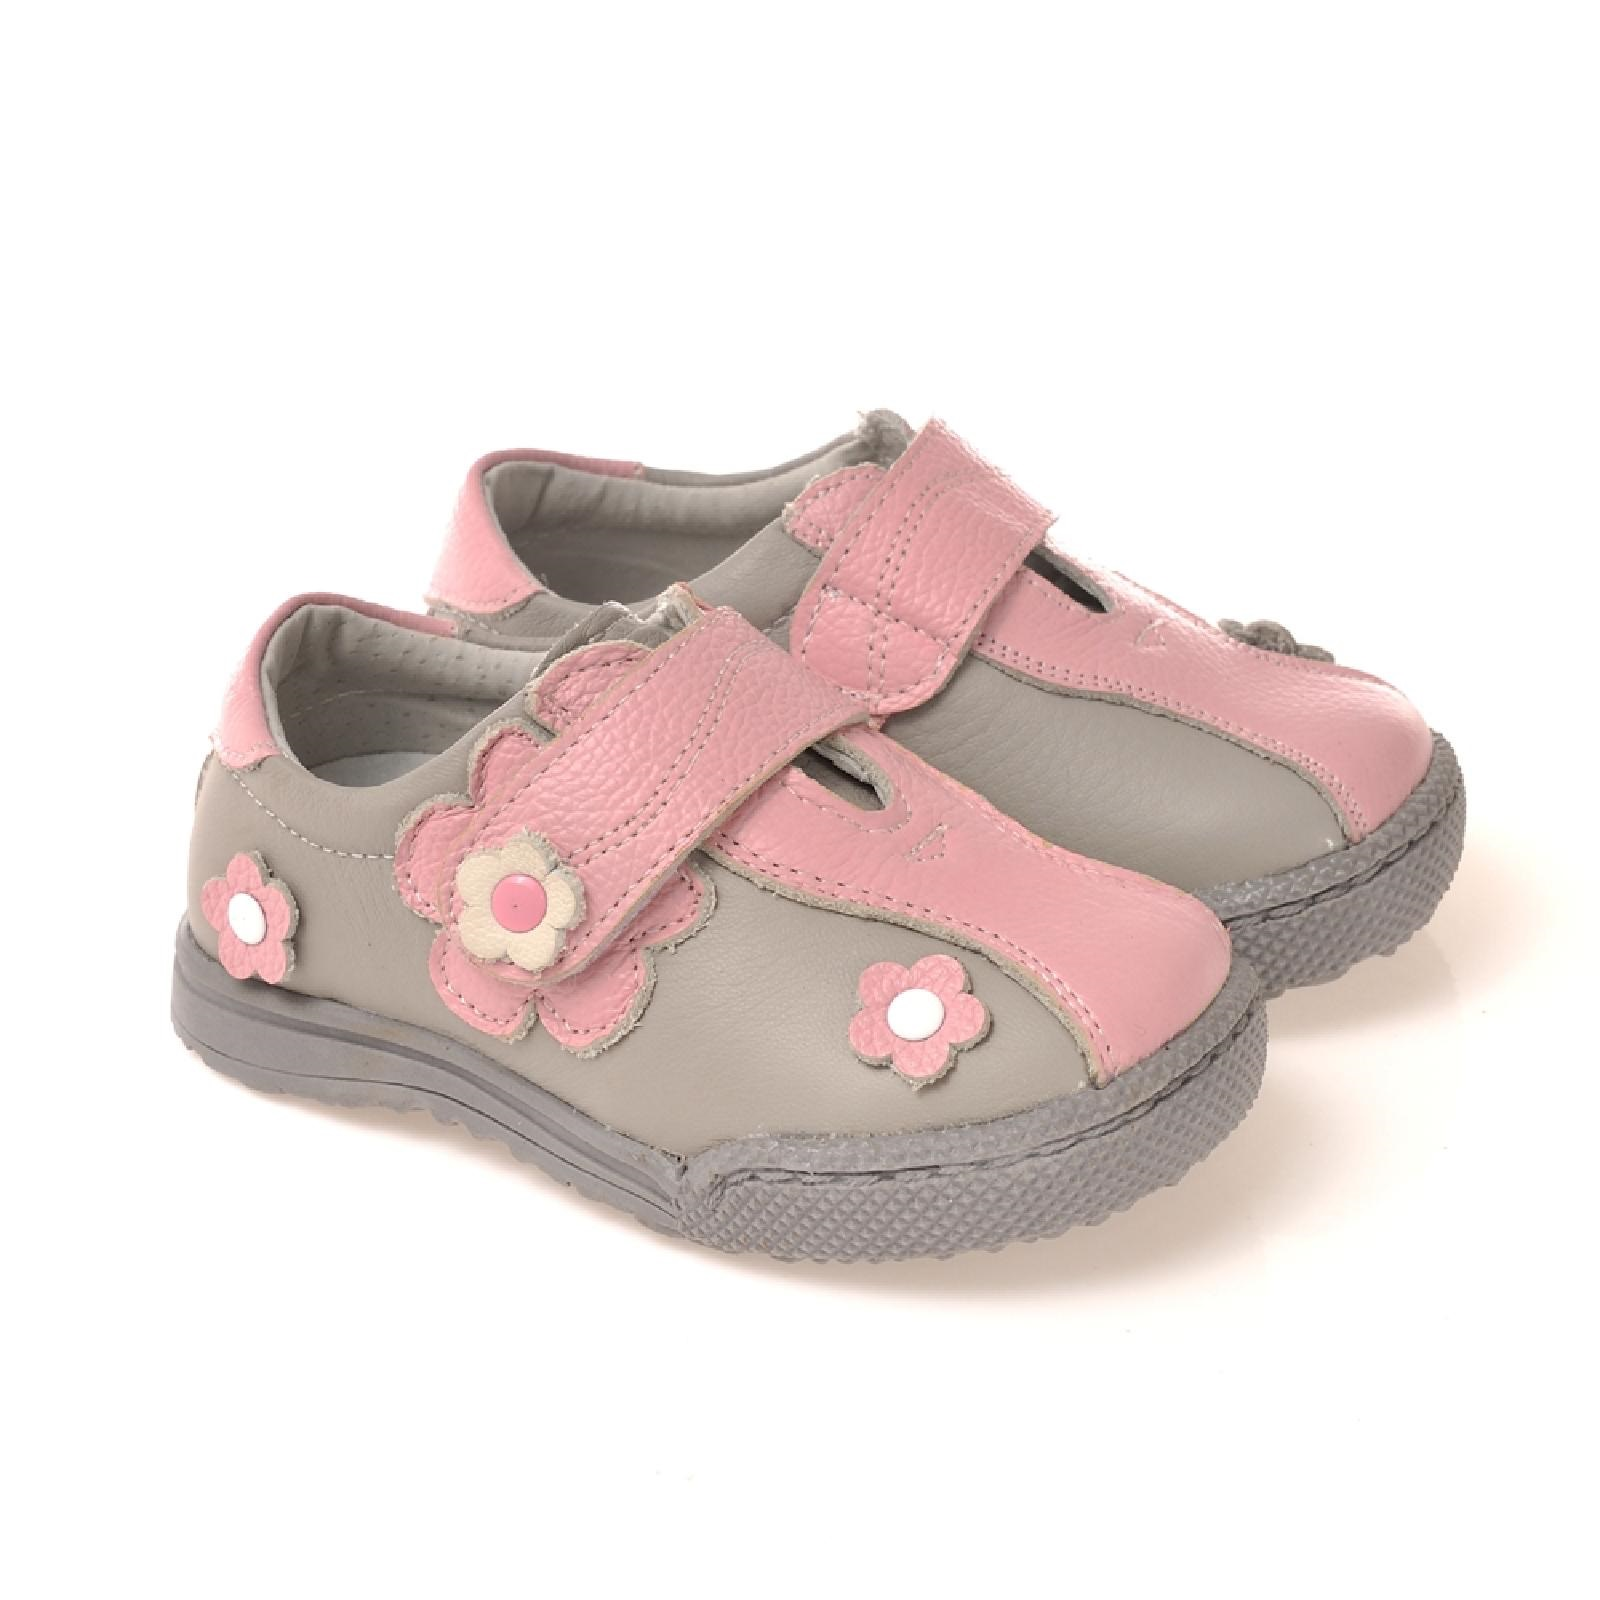 Indexbild 8 - Caroch Mädchen Sneaker Kinderschuhe Halbschuhe aus Leder